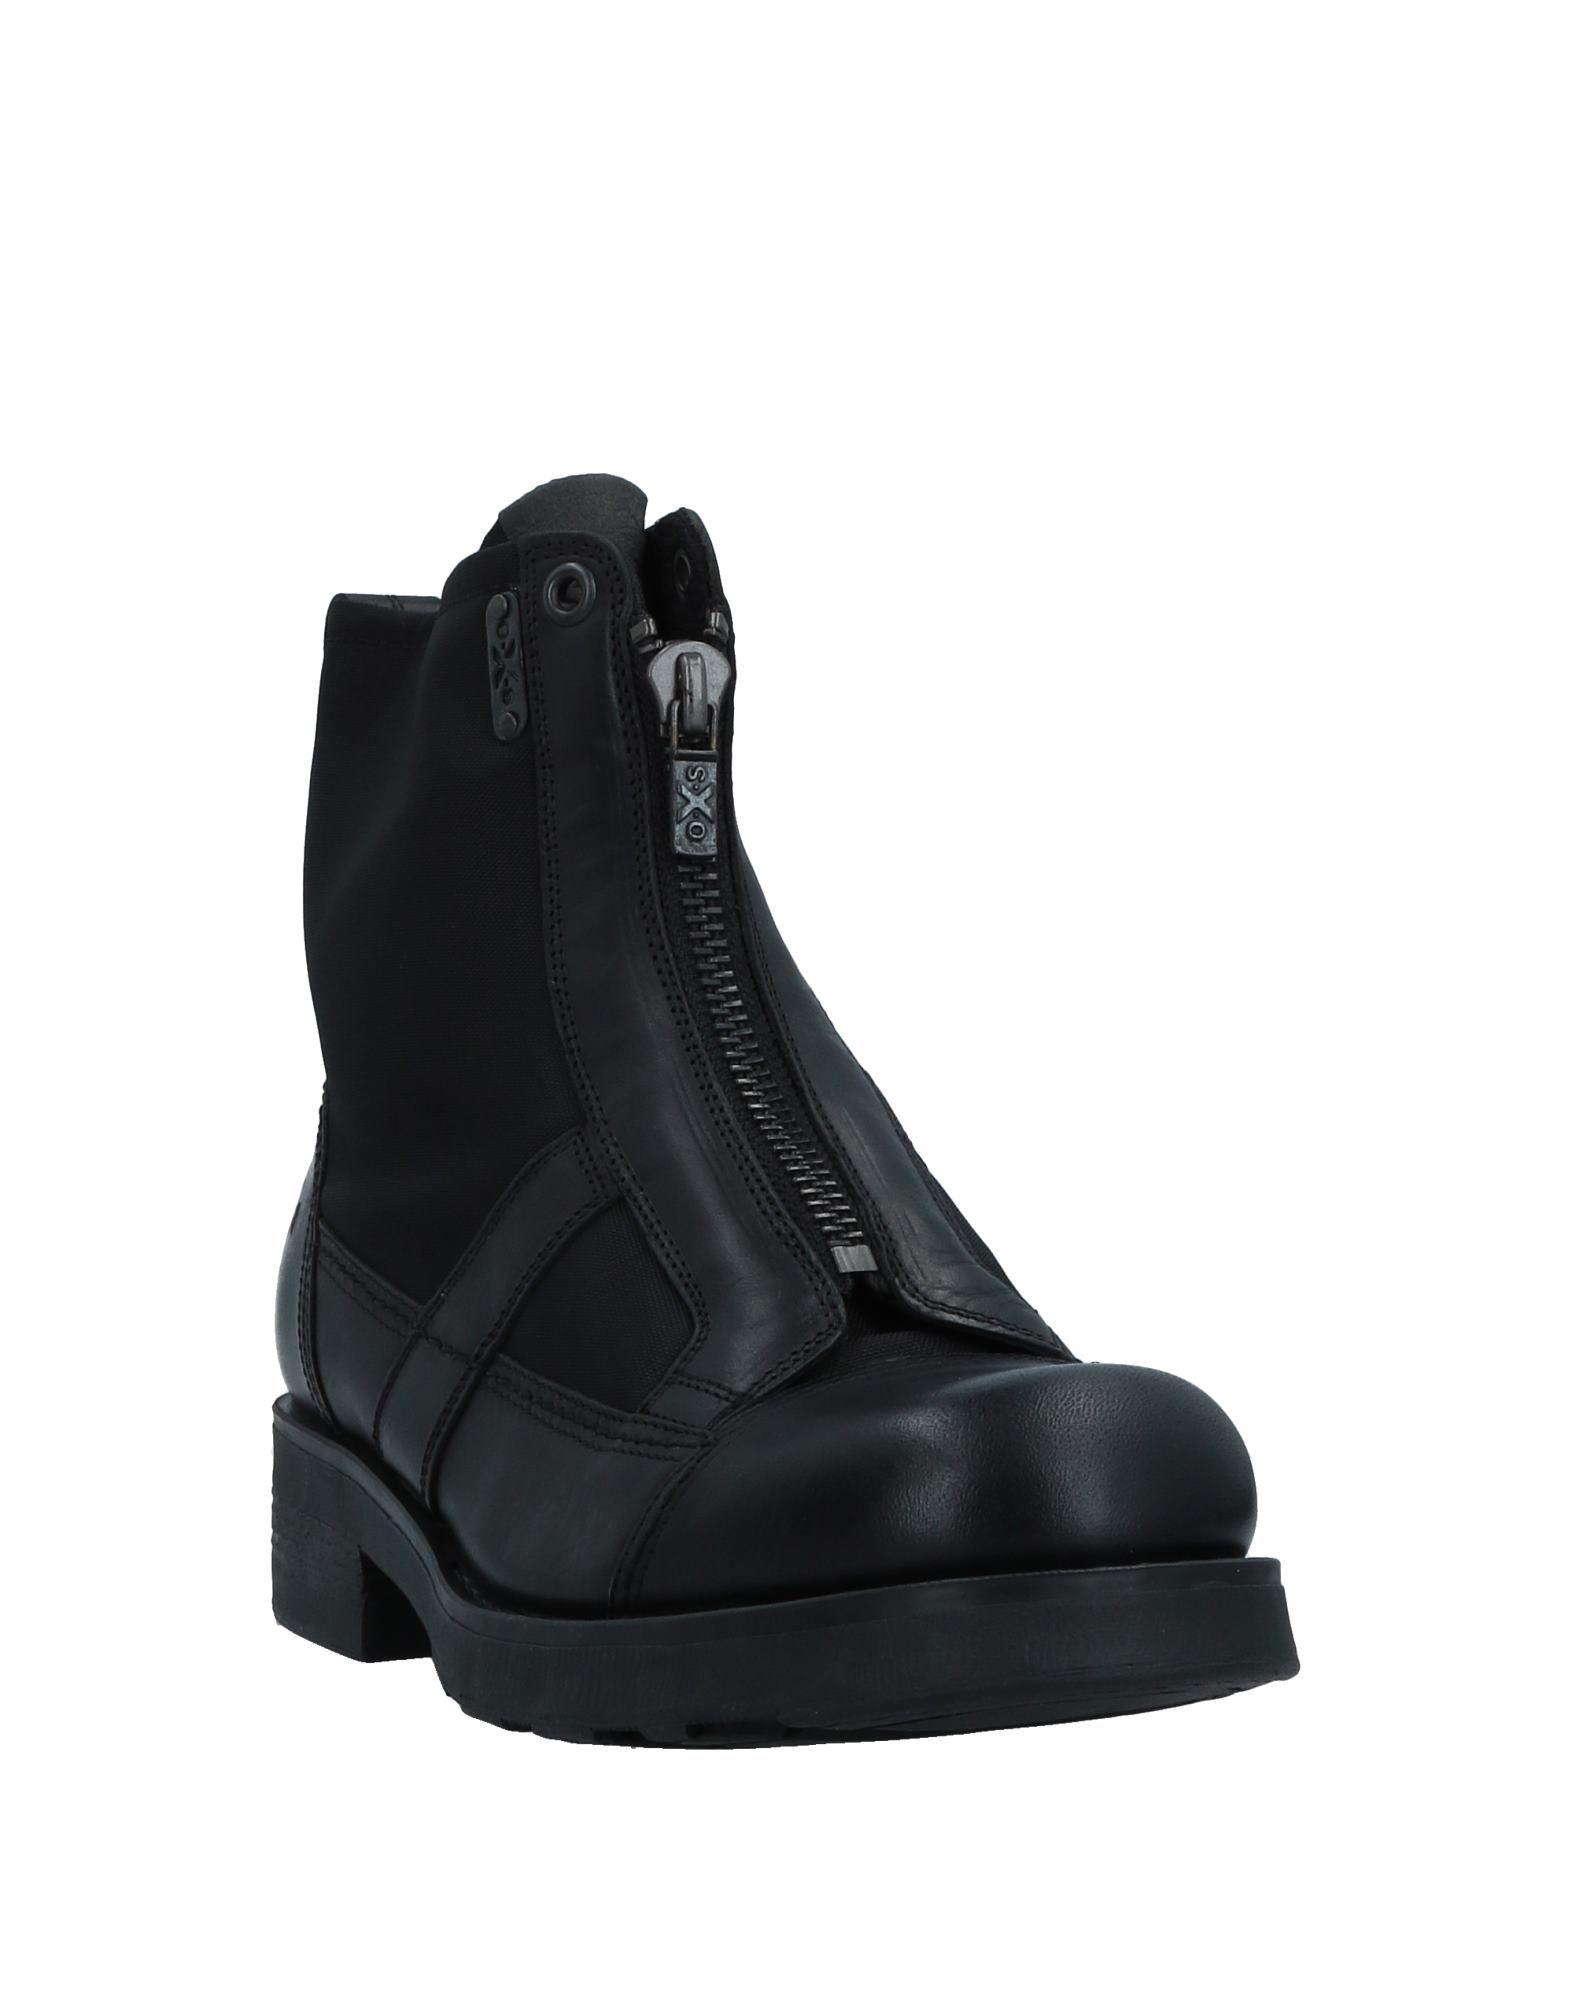 Rabatt echte Schuhe O.X.S. Stiefelette Herren   Herren 11518107SH 0aa2c1